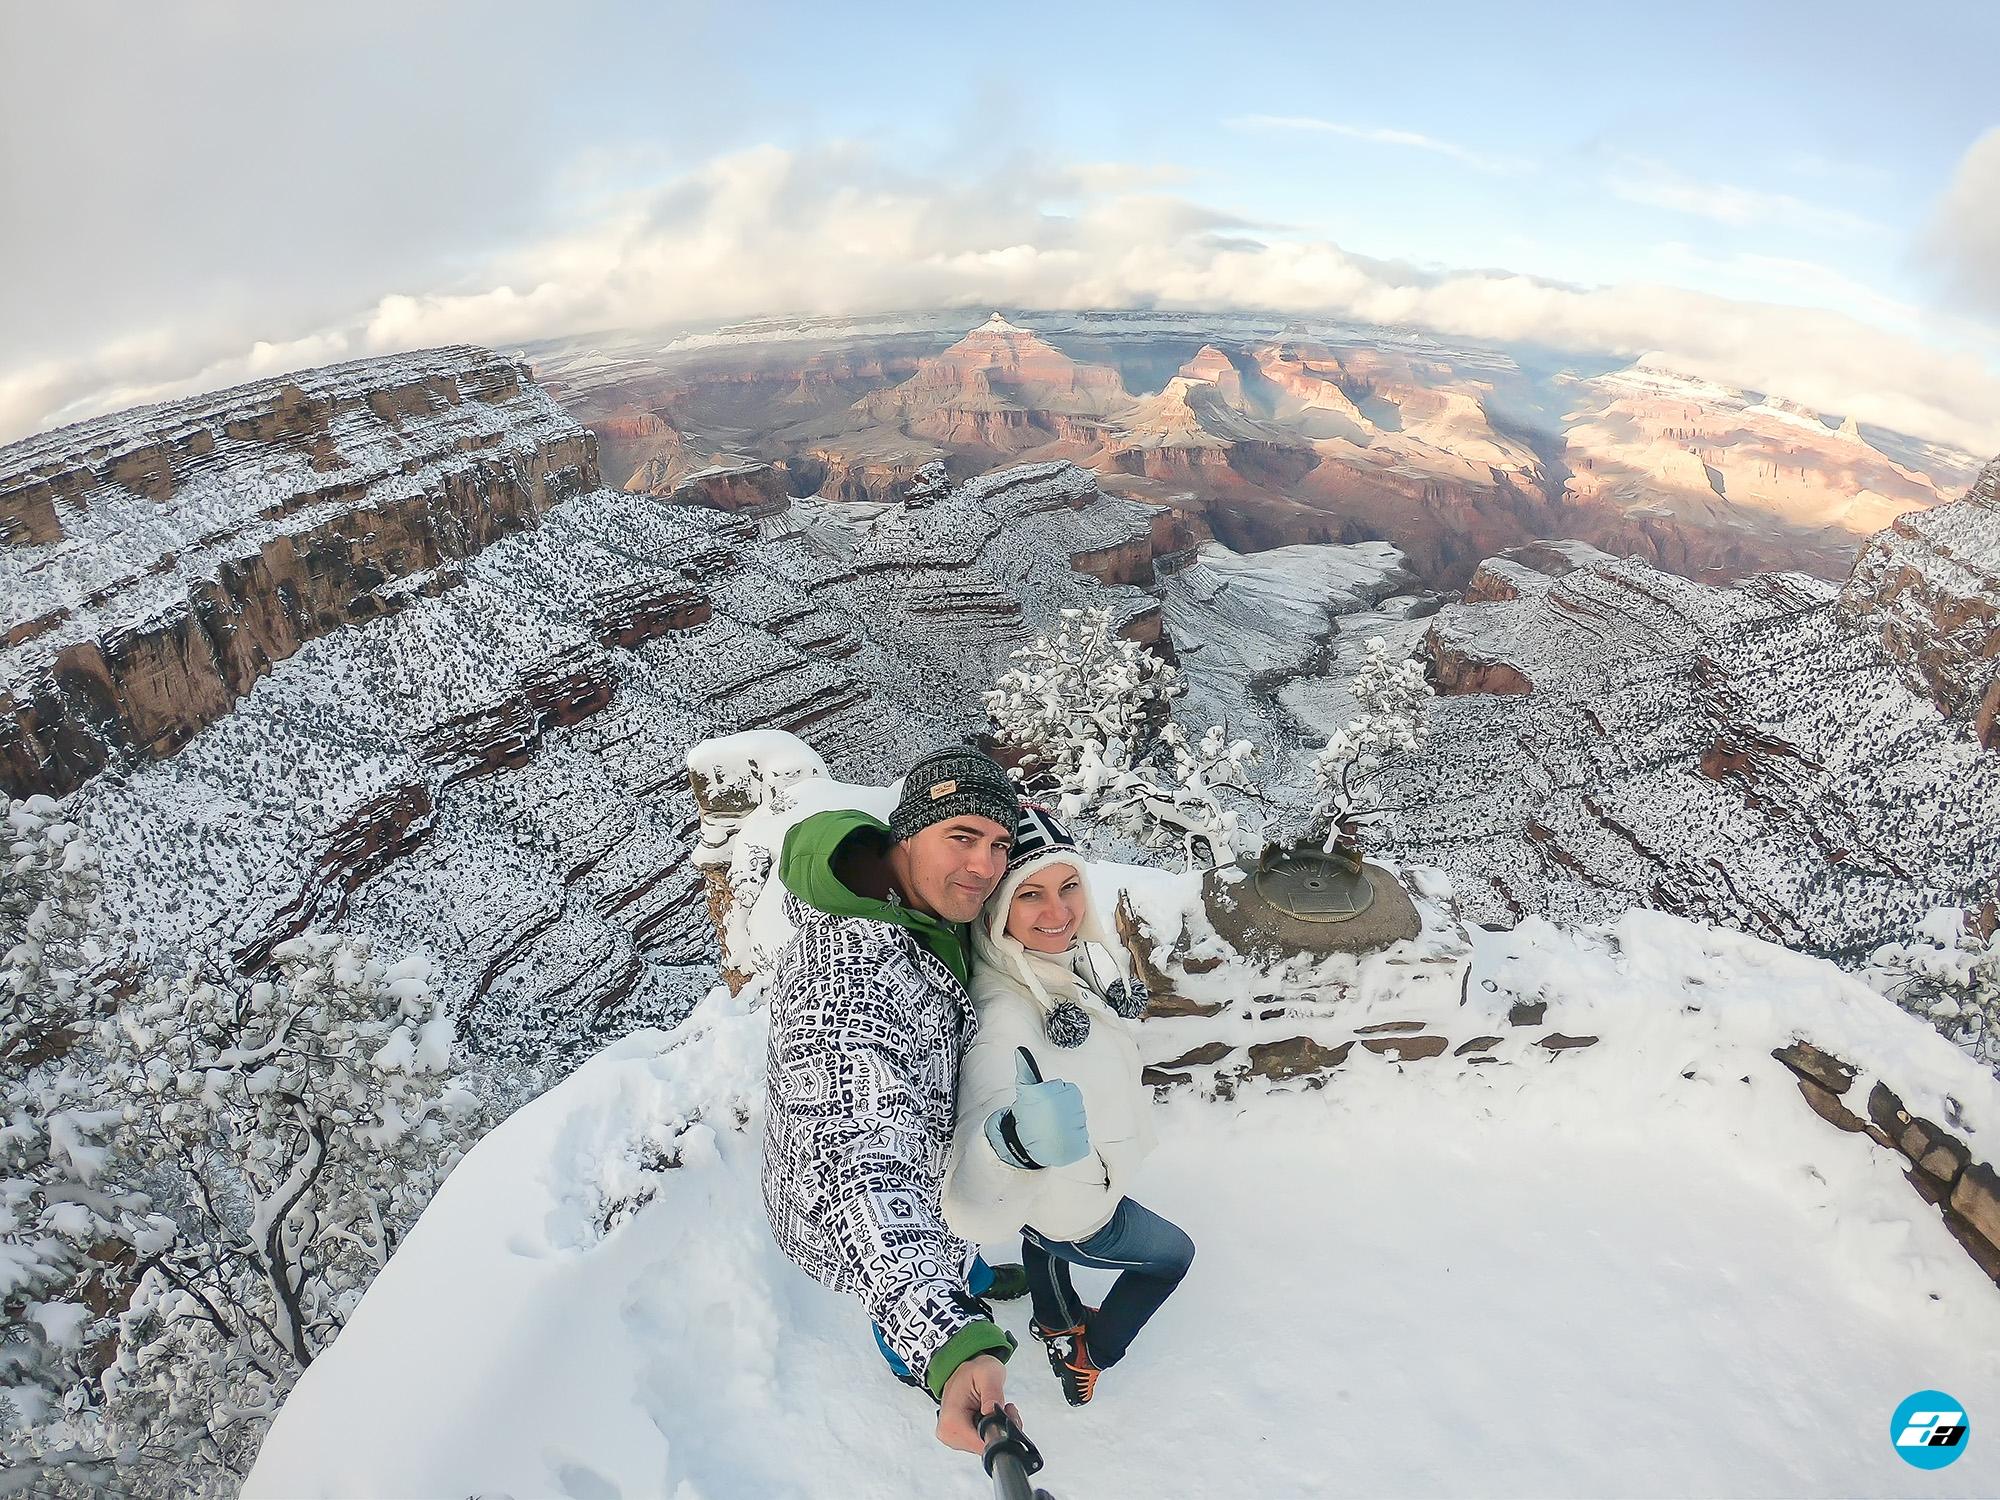 Arizona, USA. Canyon View. Family. Couple. Explorers. Winter Season. Arizona Attraction & Travel.